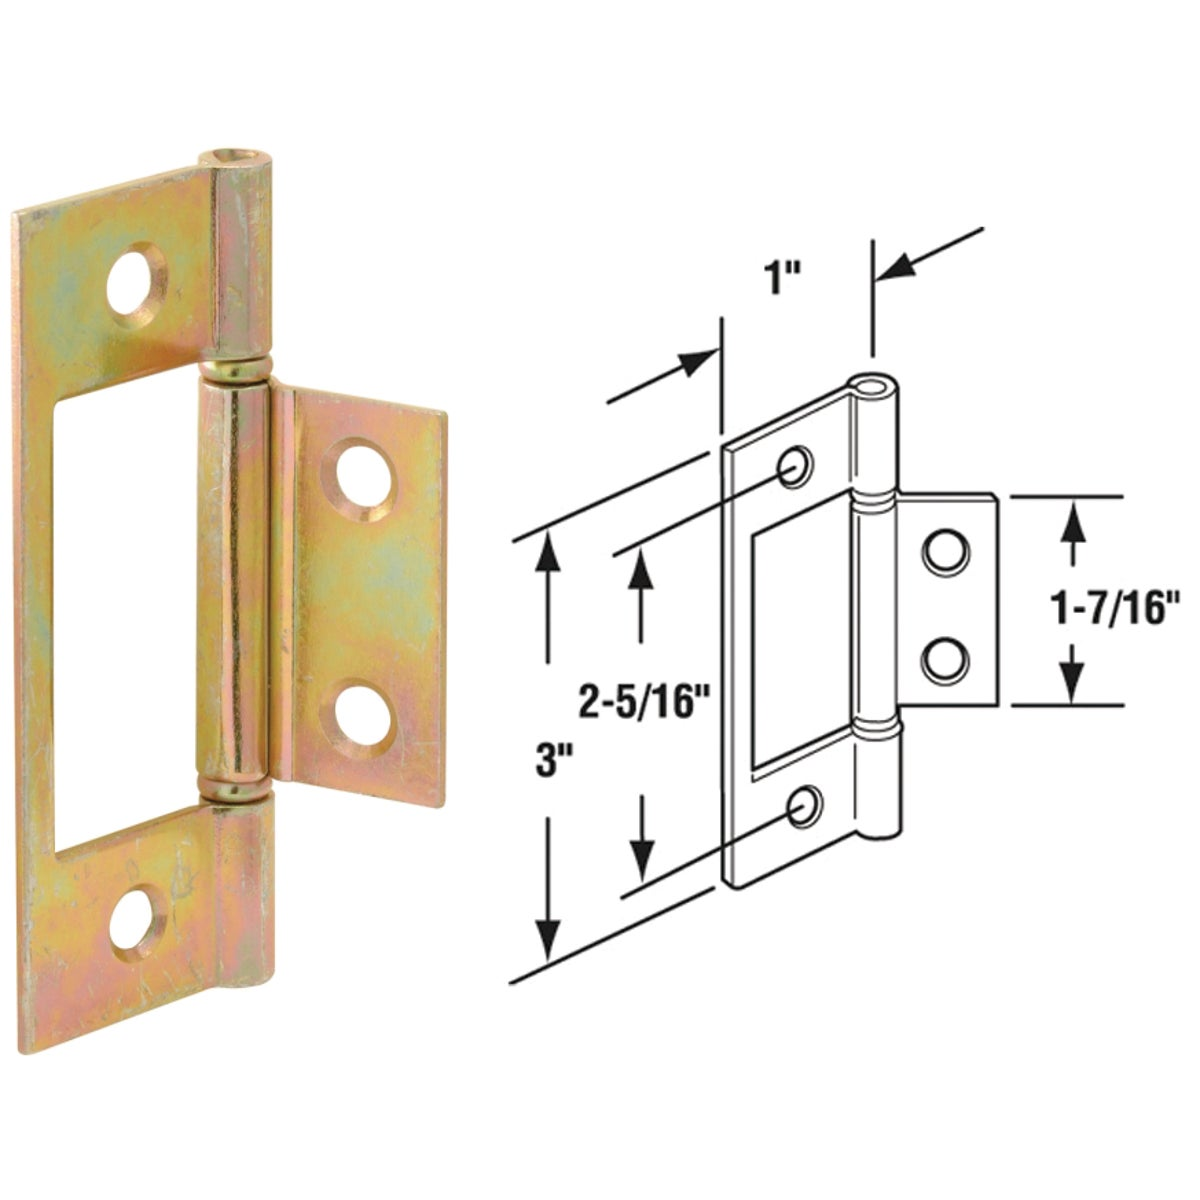 BI-FOLD CLOSET DR HINGE - 161497 by Prime Line Products